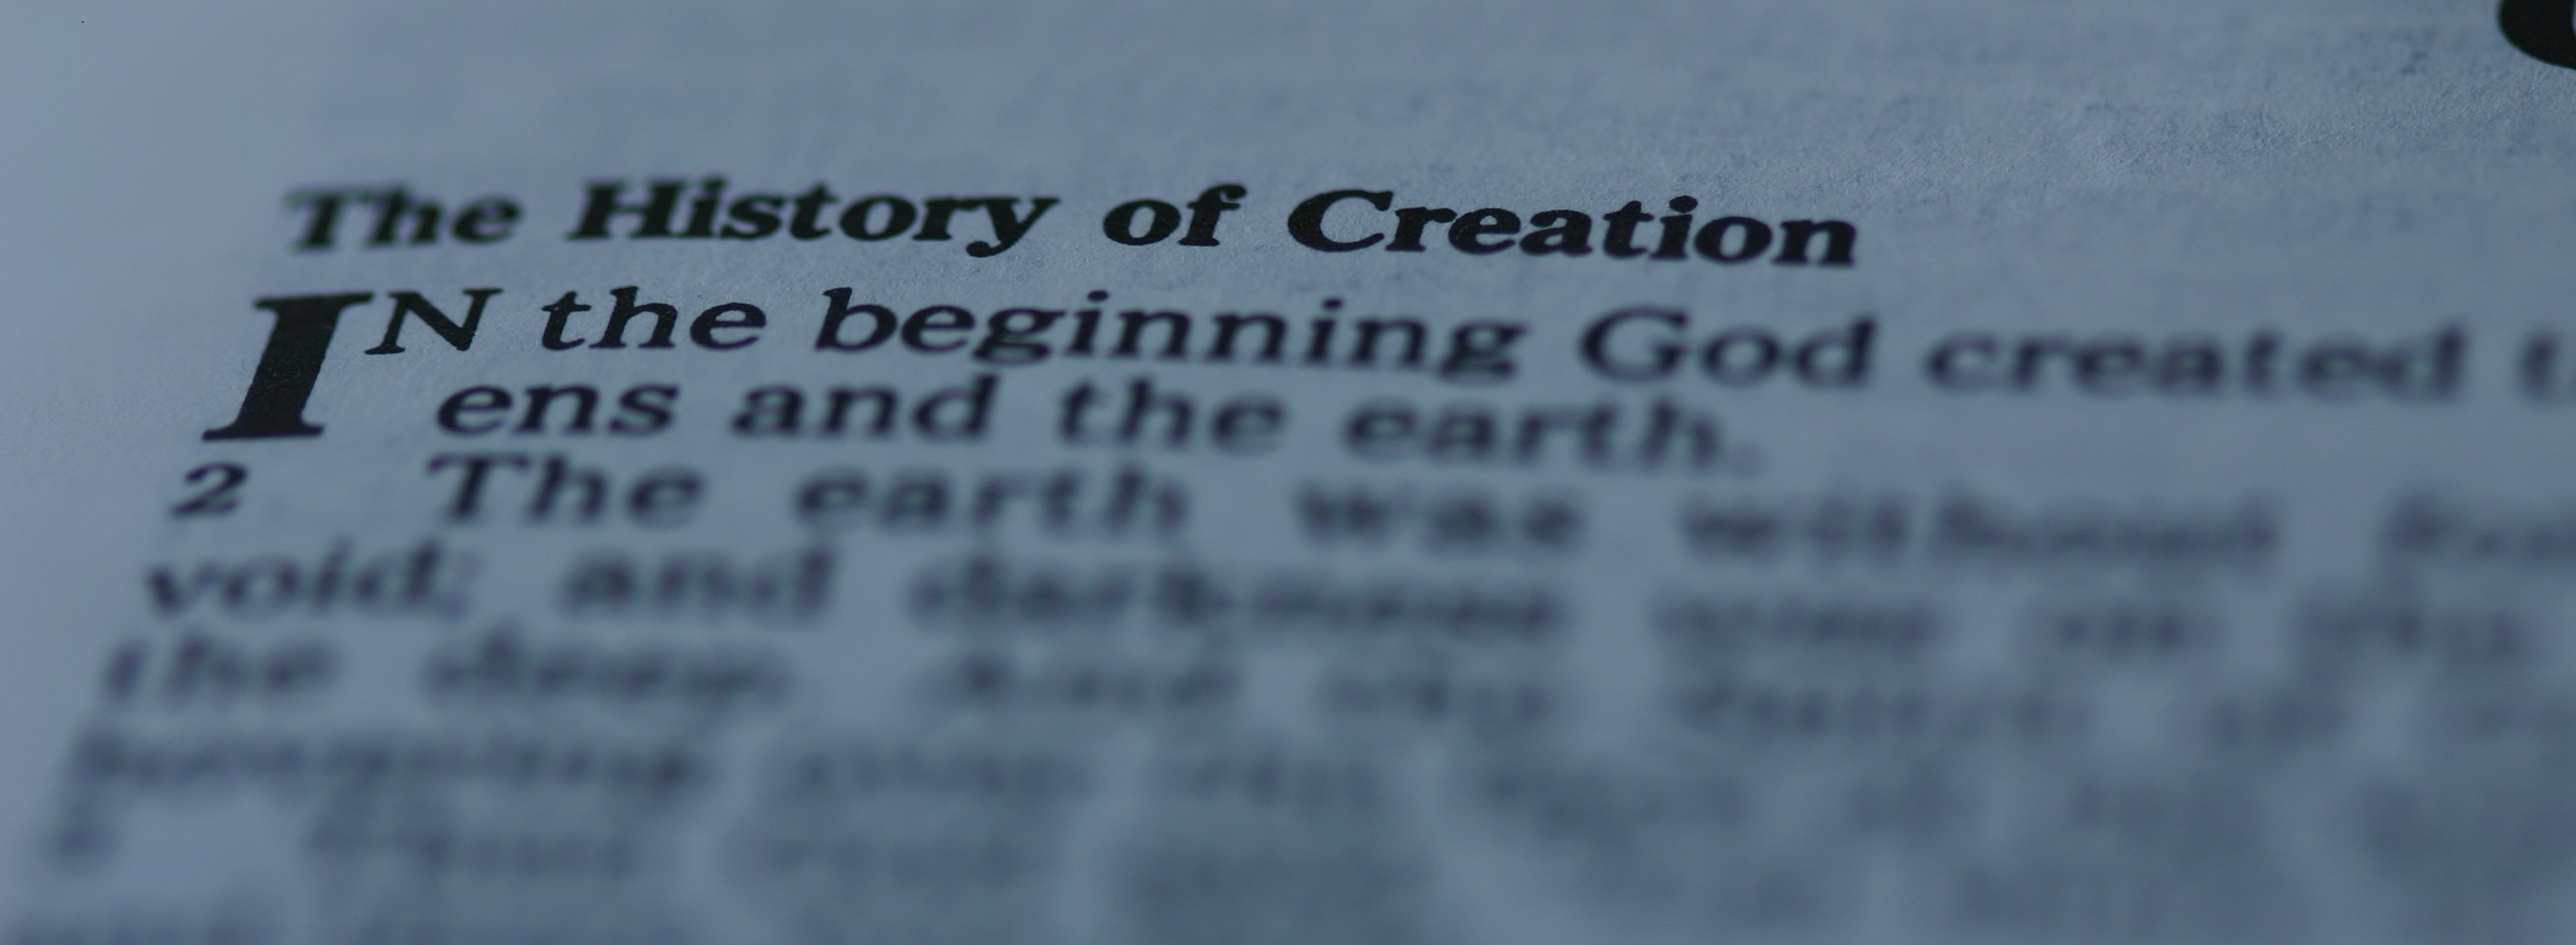 Genesis 1-1 in Bible (Christianphotos.net)